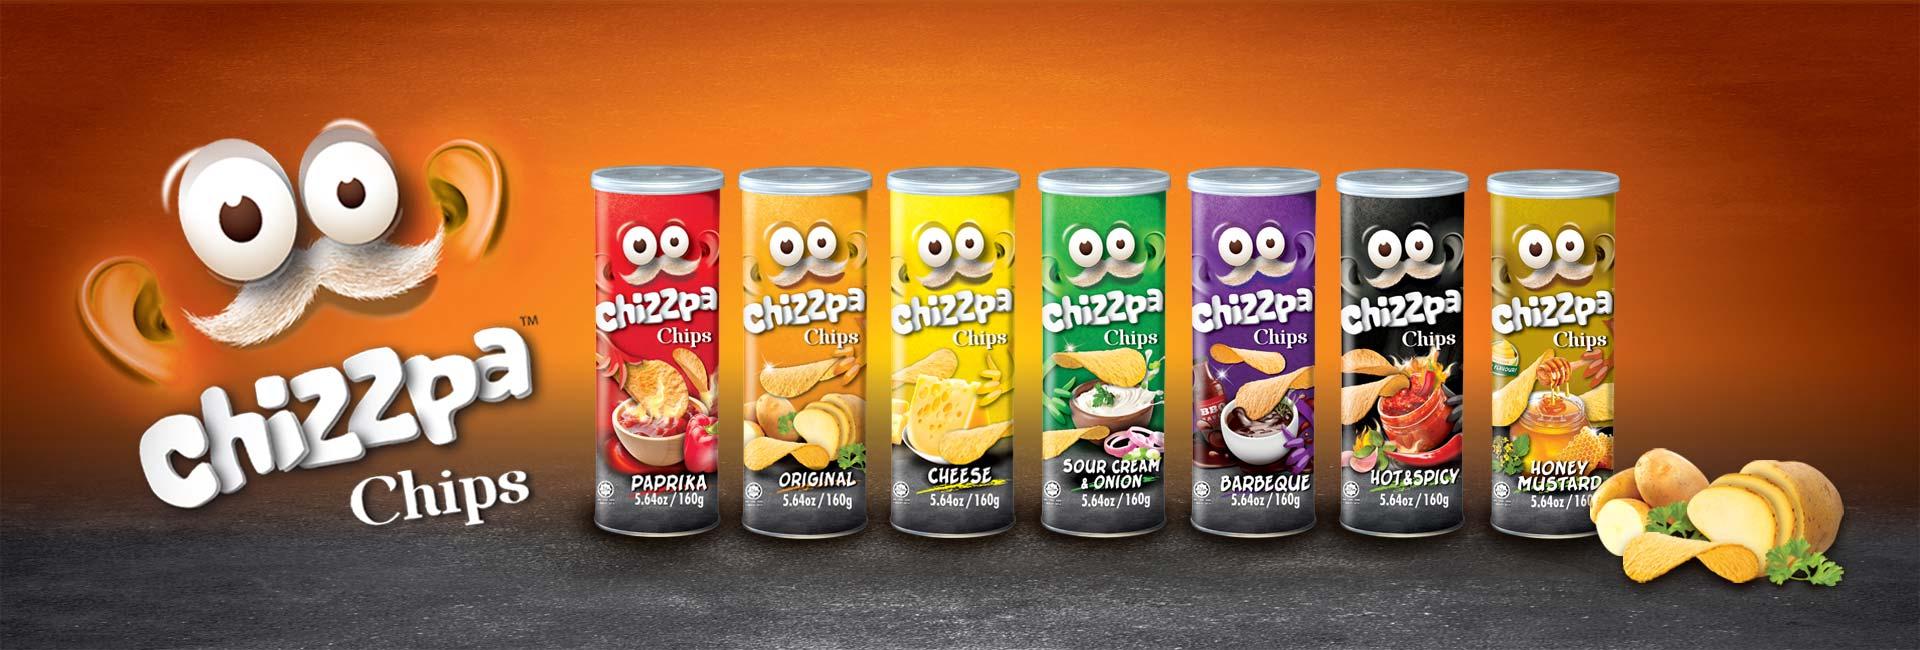 Snack - Chizzpa Chips